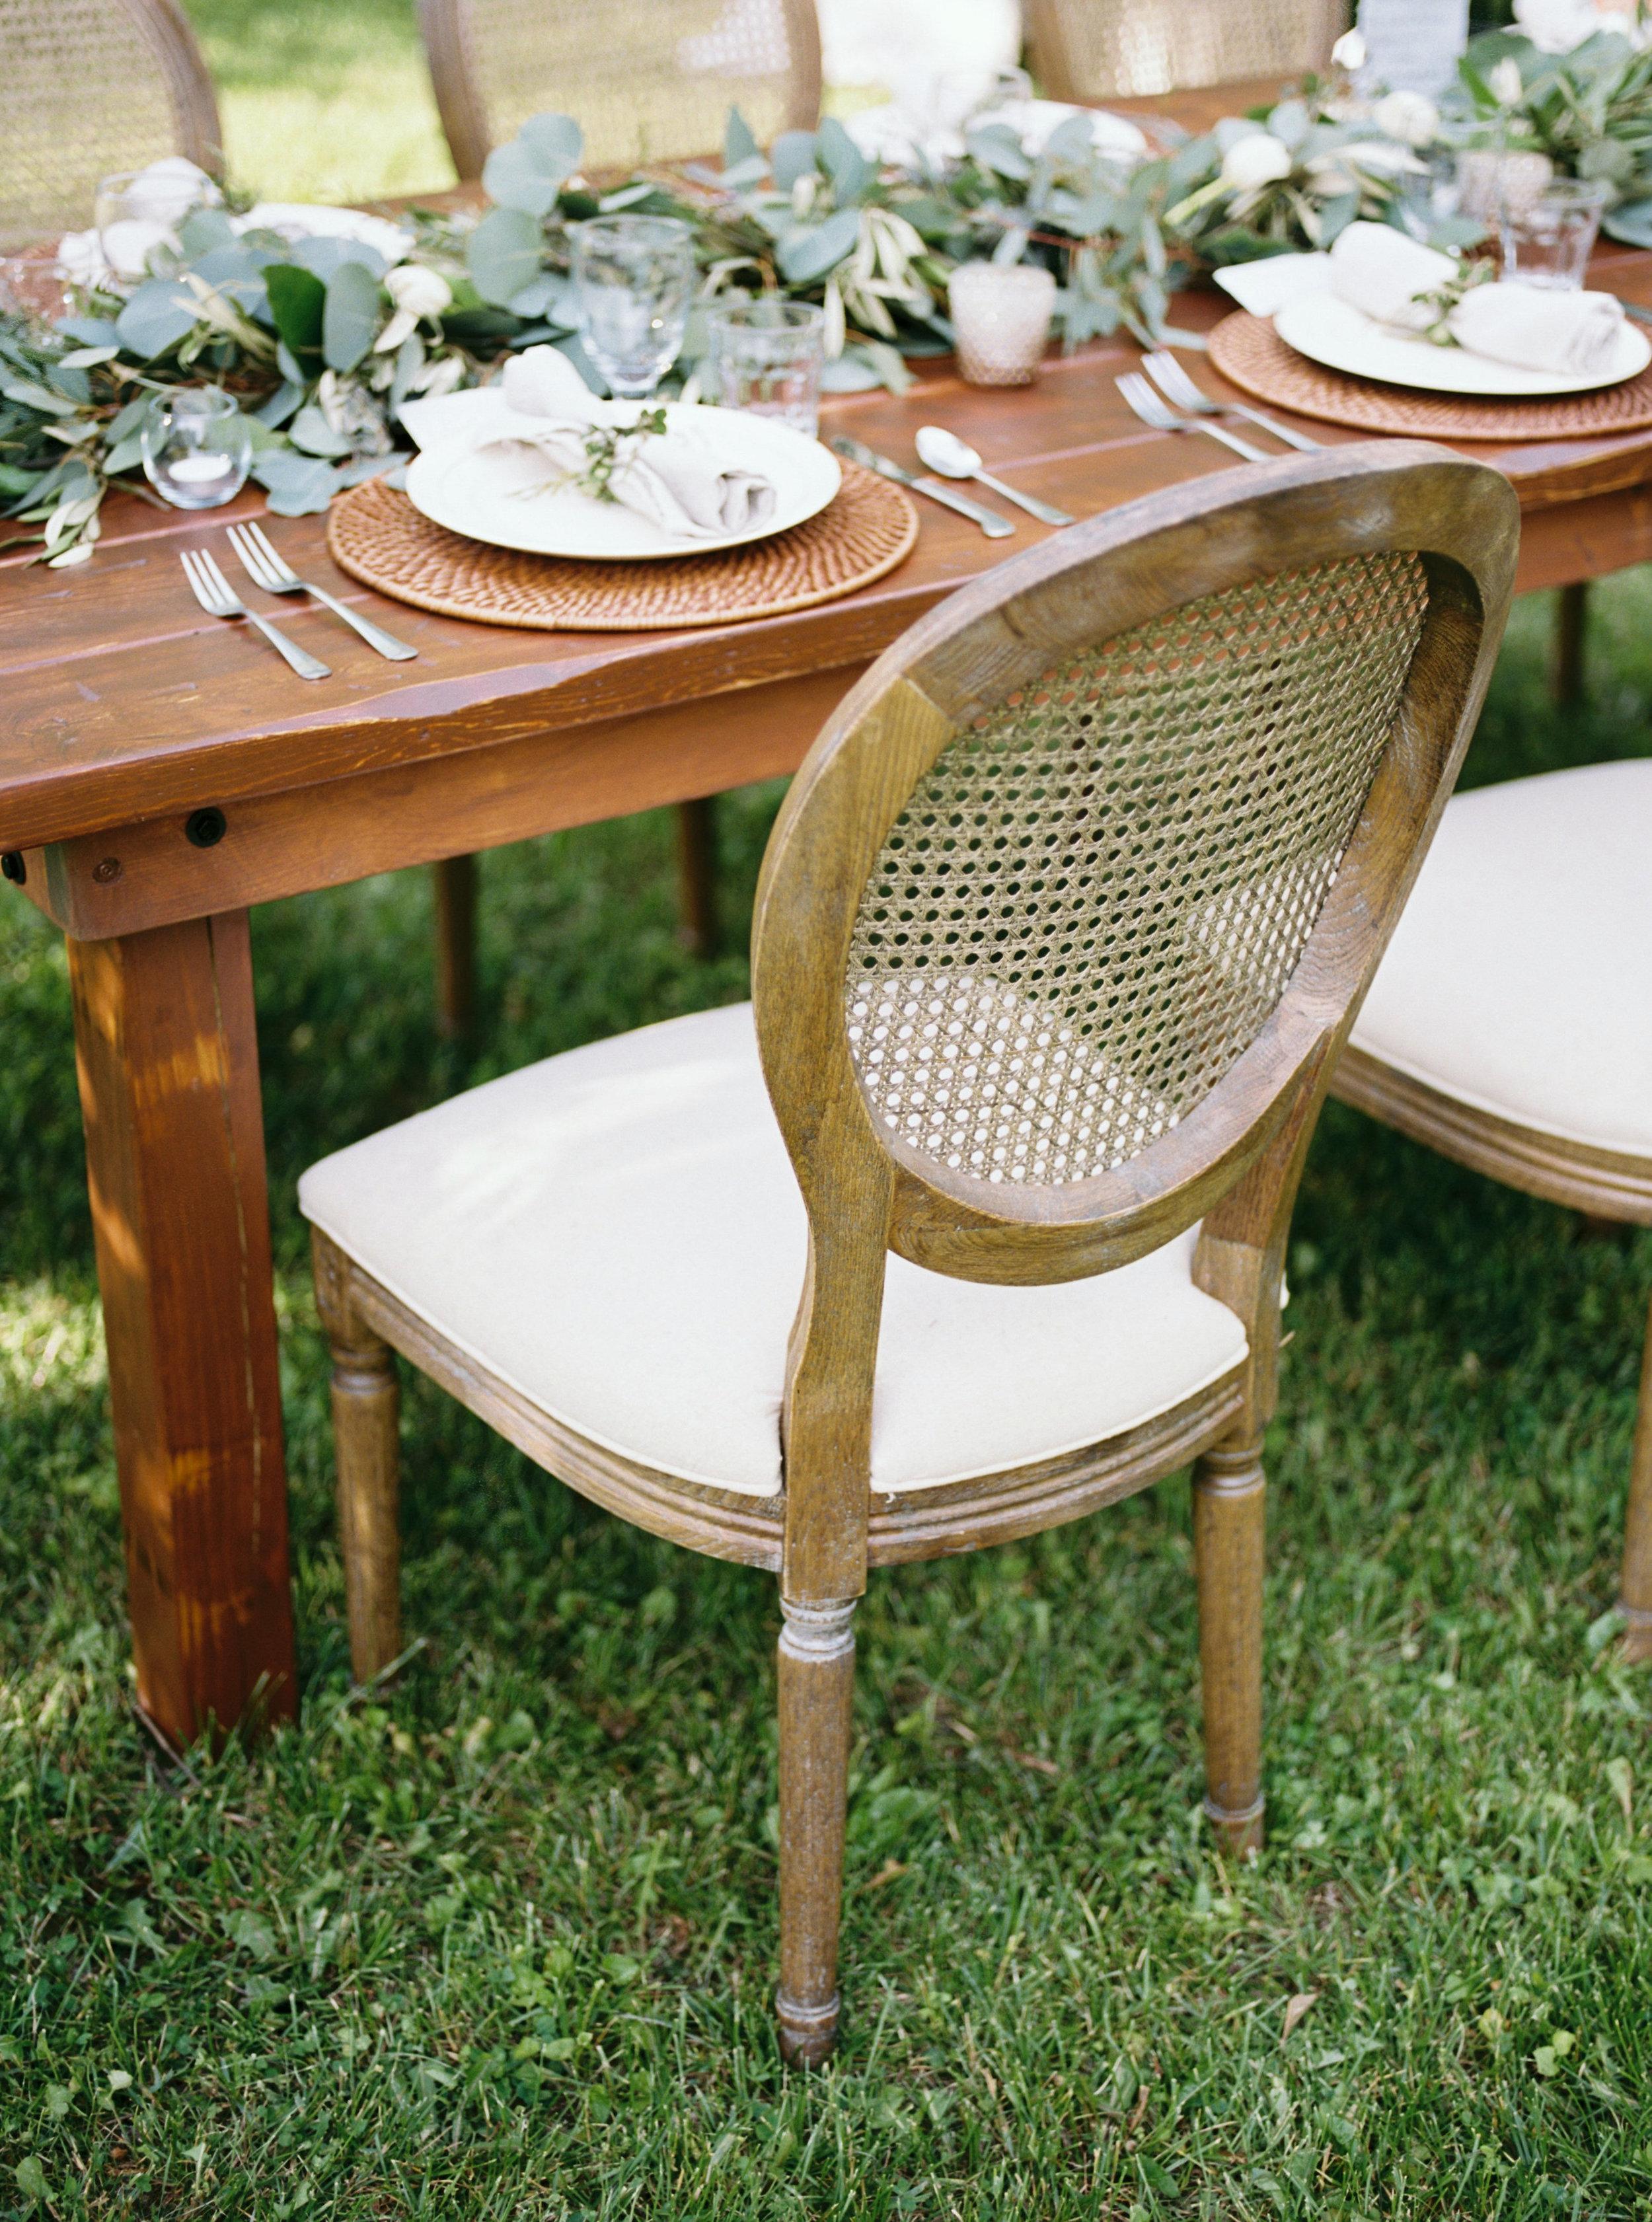 greenhouse-wedding-inspiration-by-laurelyn-savannah-photography-4.jpg